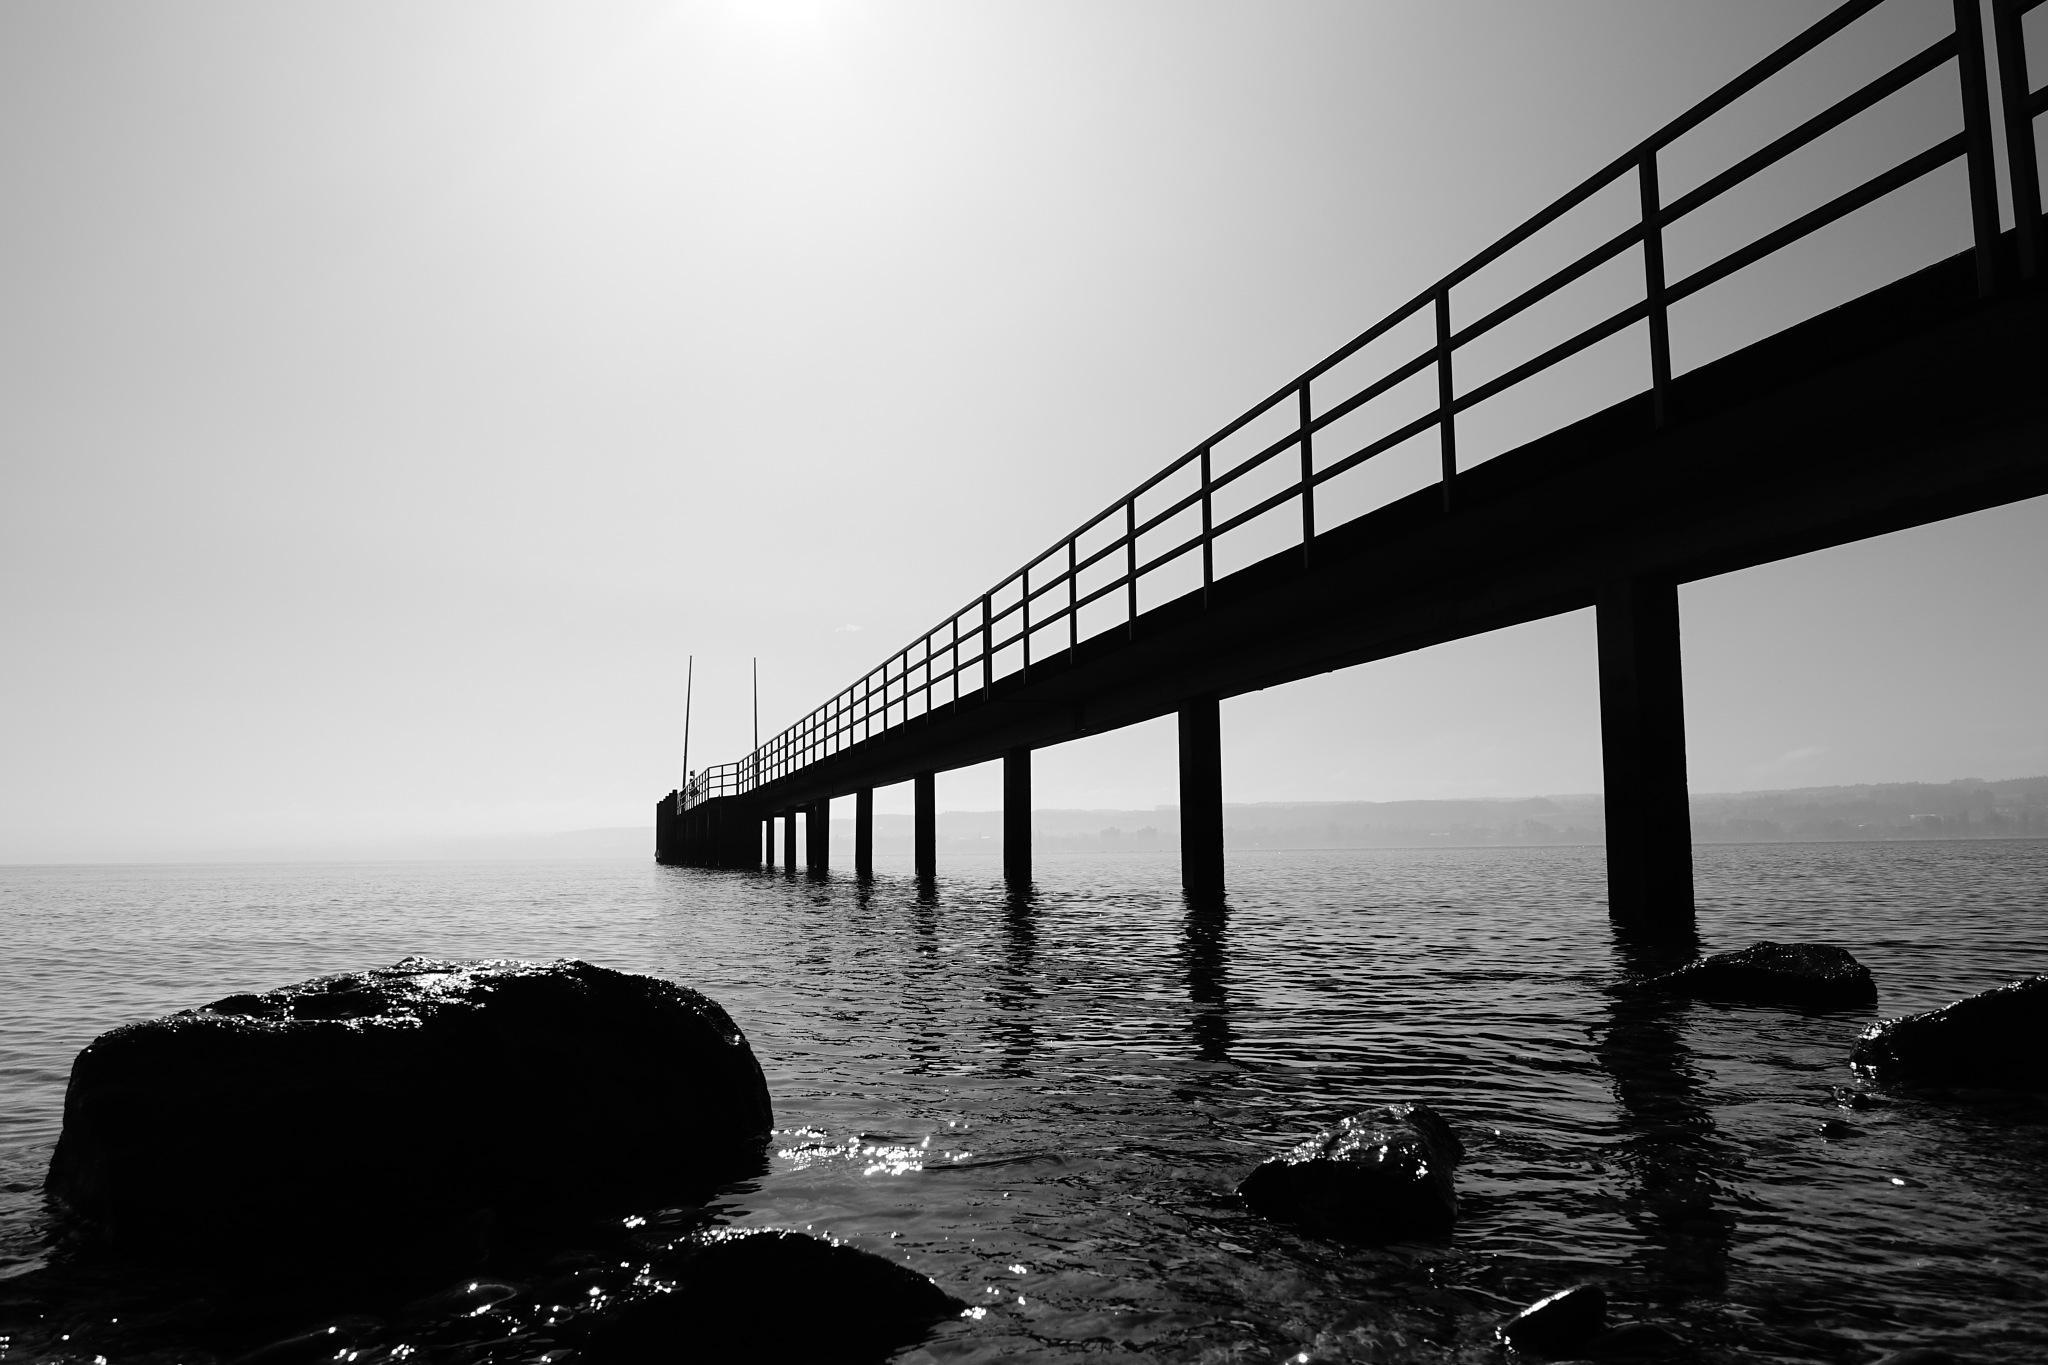 pier by Tom Eppelin